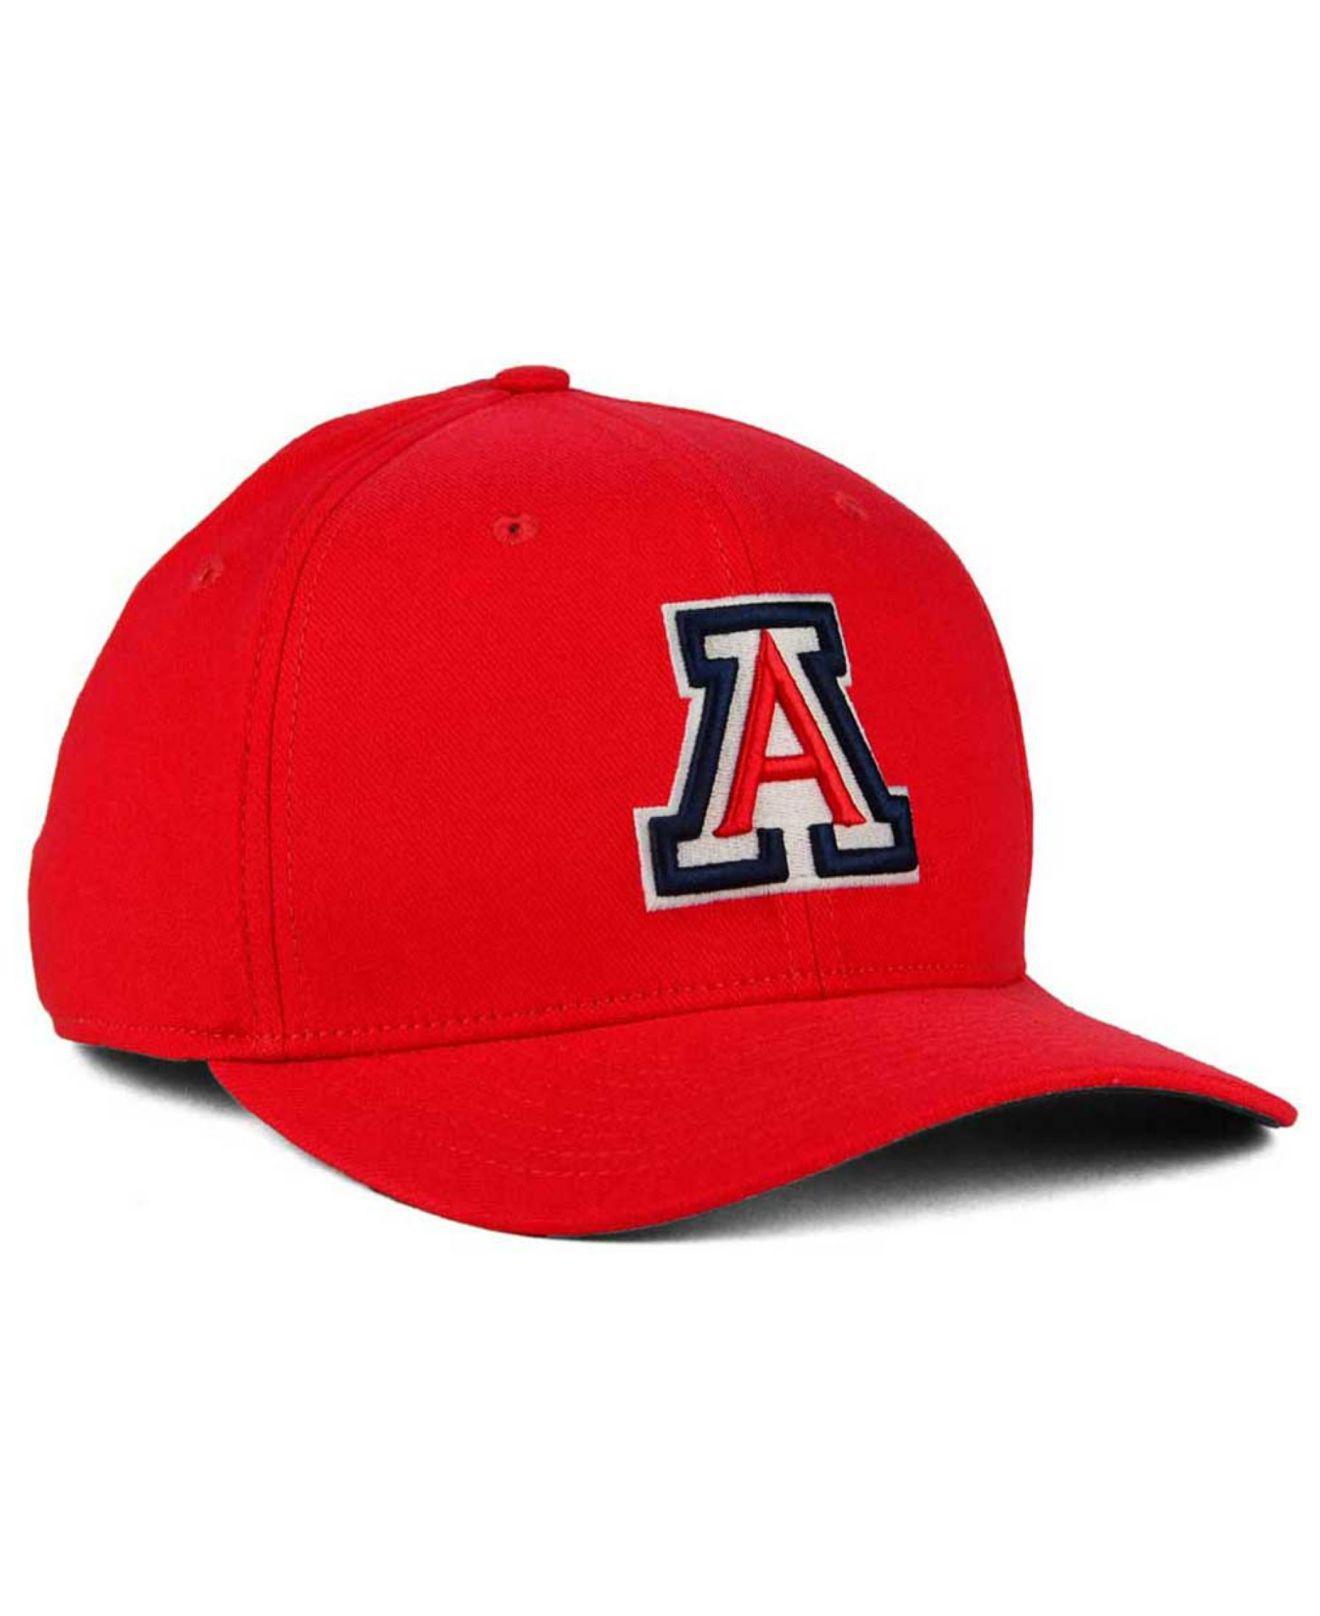 buy popular 77a58 bda93 ... sale nike red arizona wildcats classic swoosh cap for men lyst. view  fullscreen f4efb 7b280